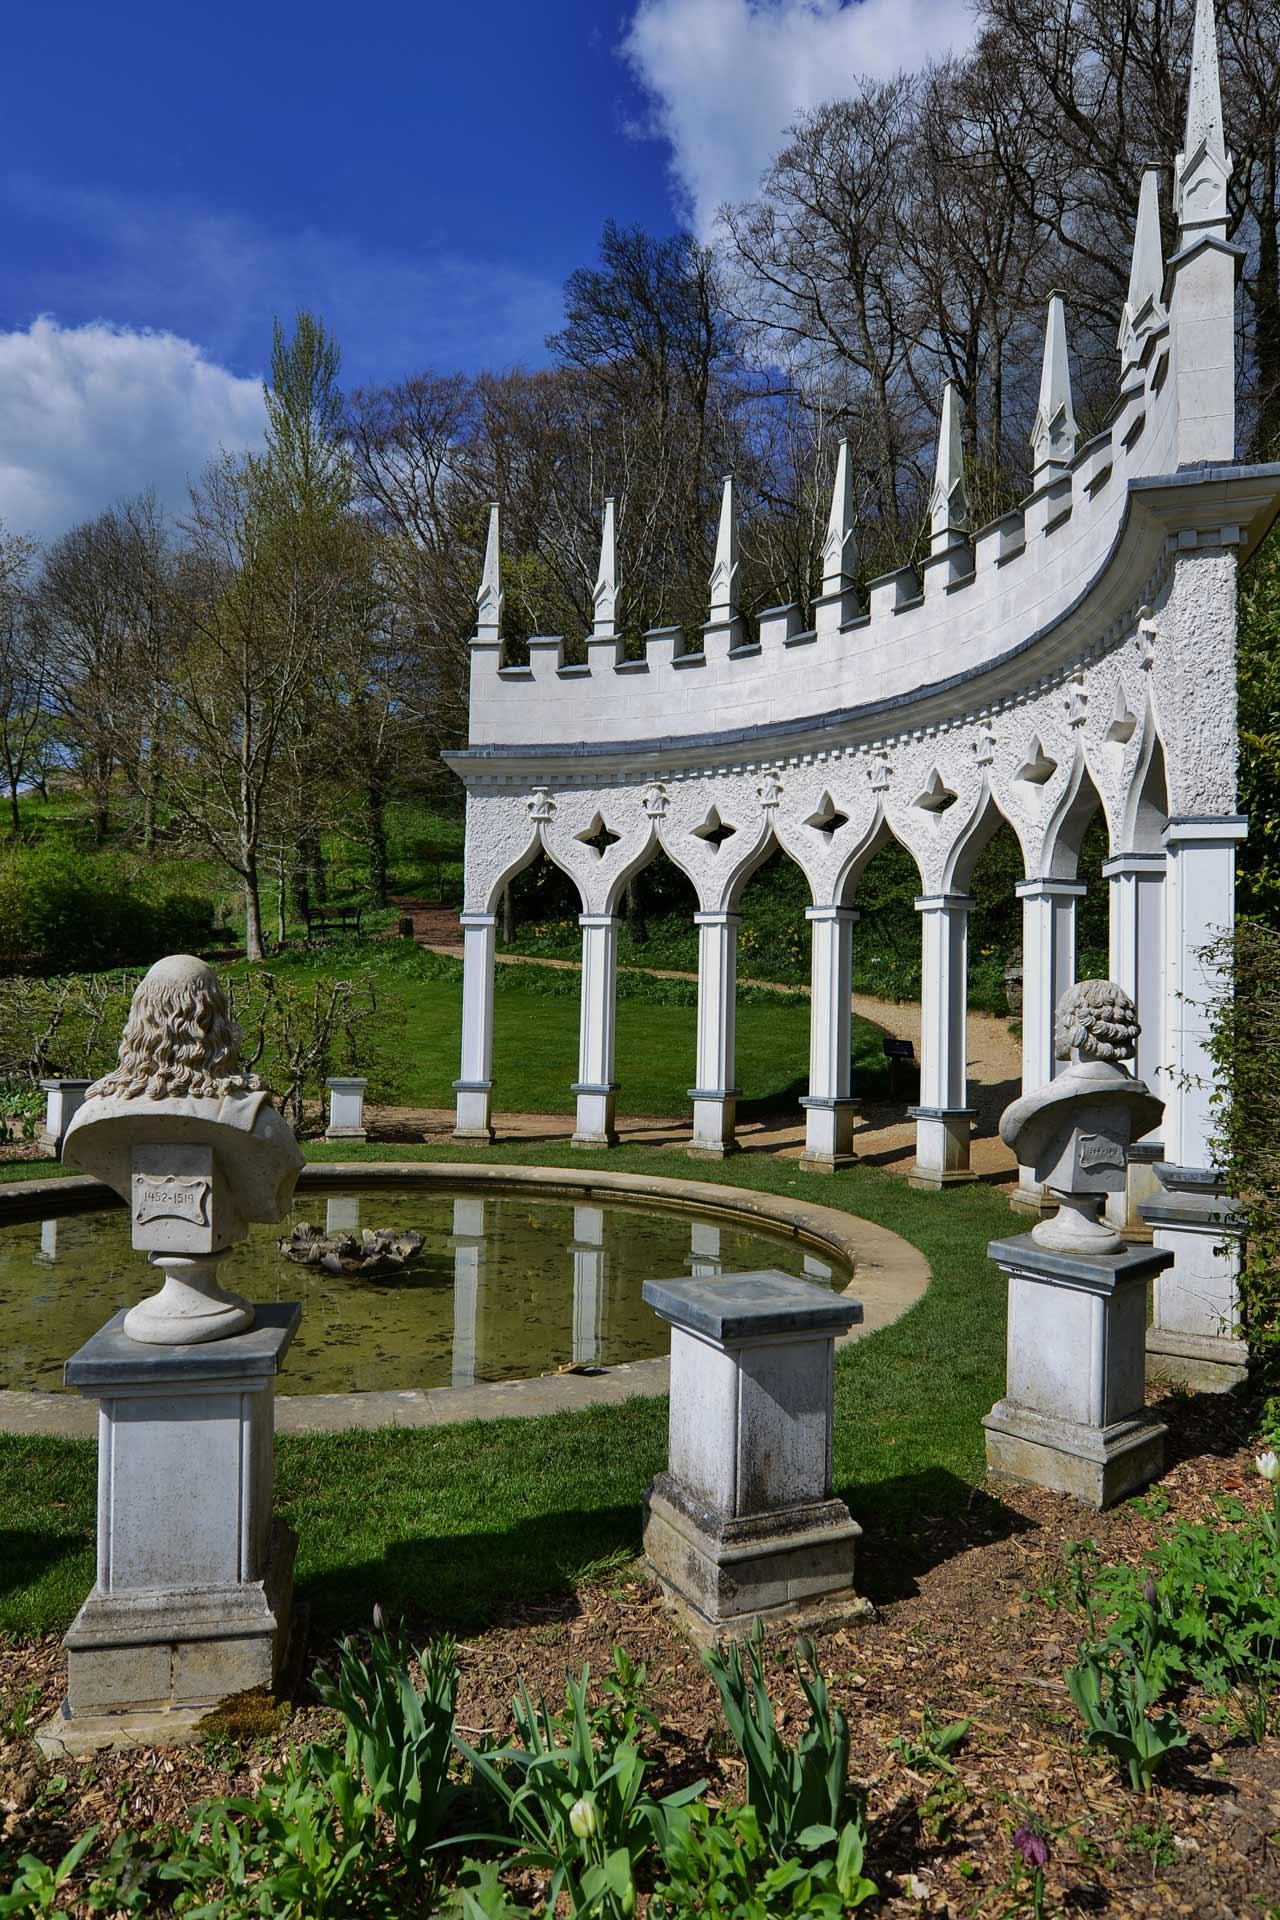 Painswick Rococo Garden by Michael Garlick.